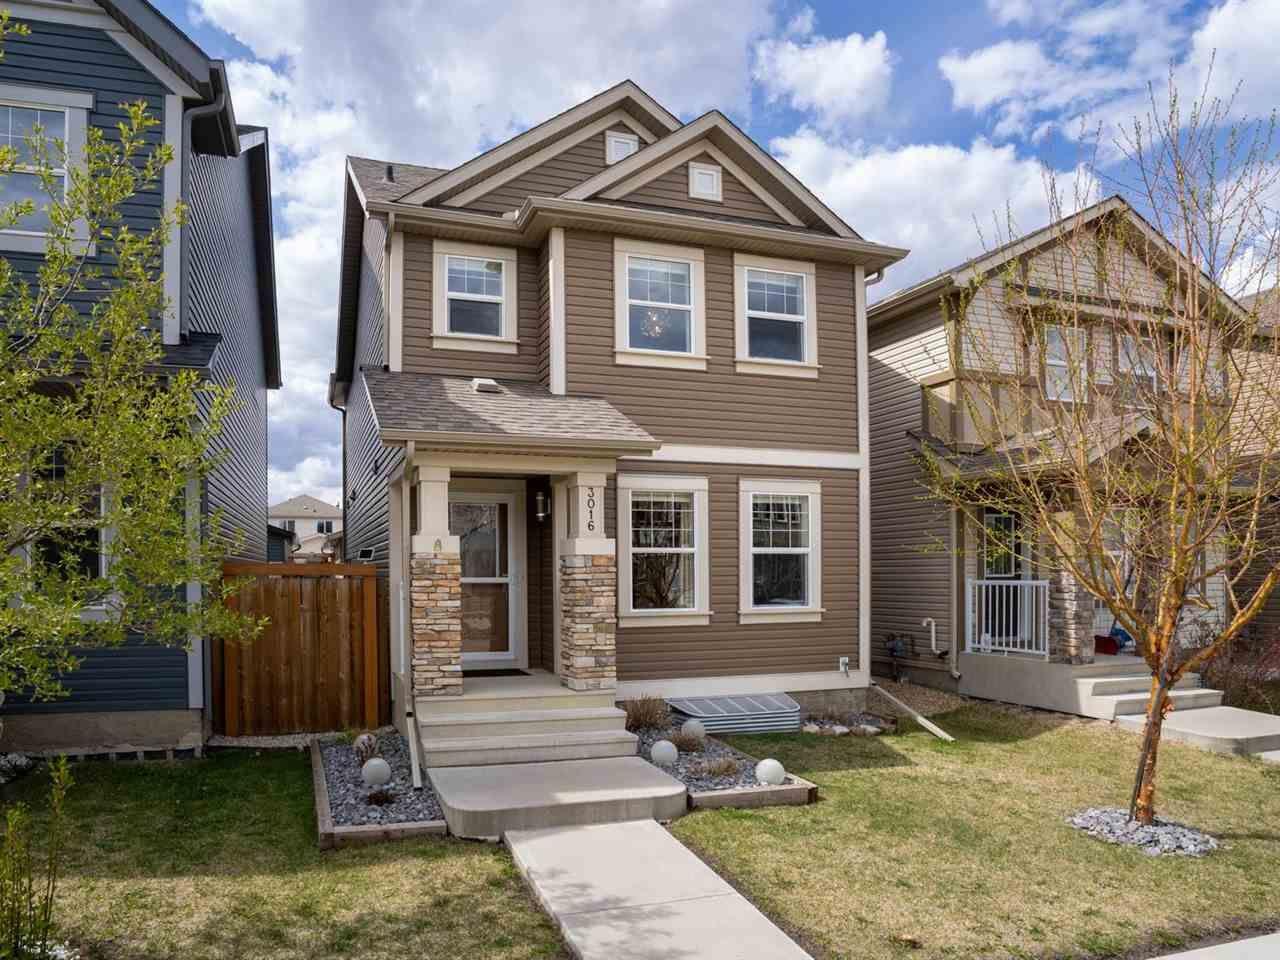 Main Photo: Allard in Edmonton: Zone 55 House for sale : MLS®# E4244022